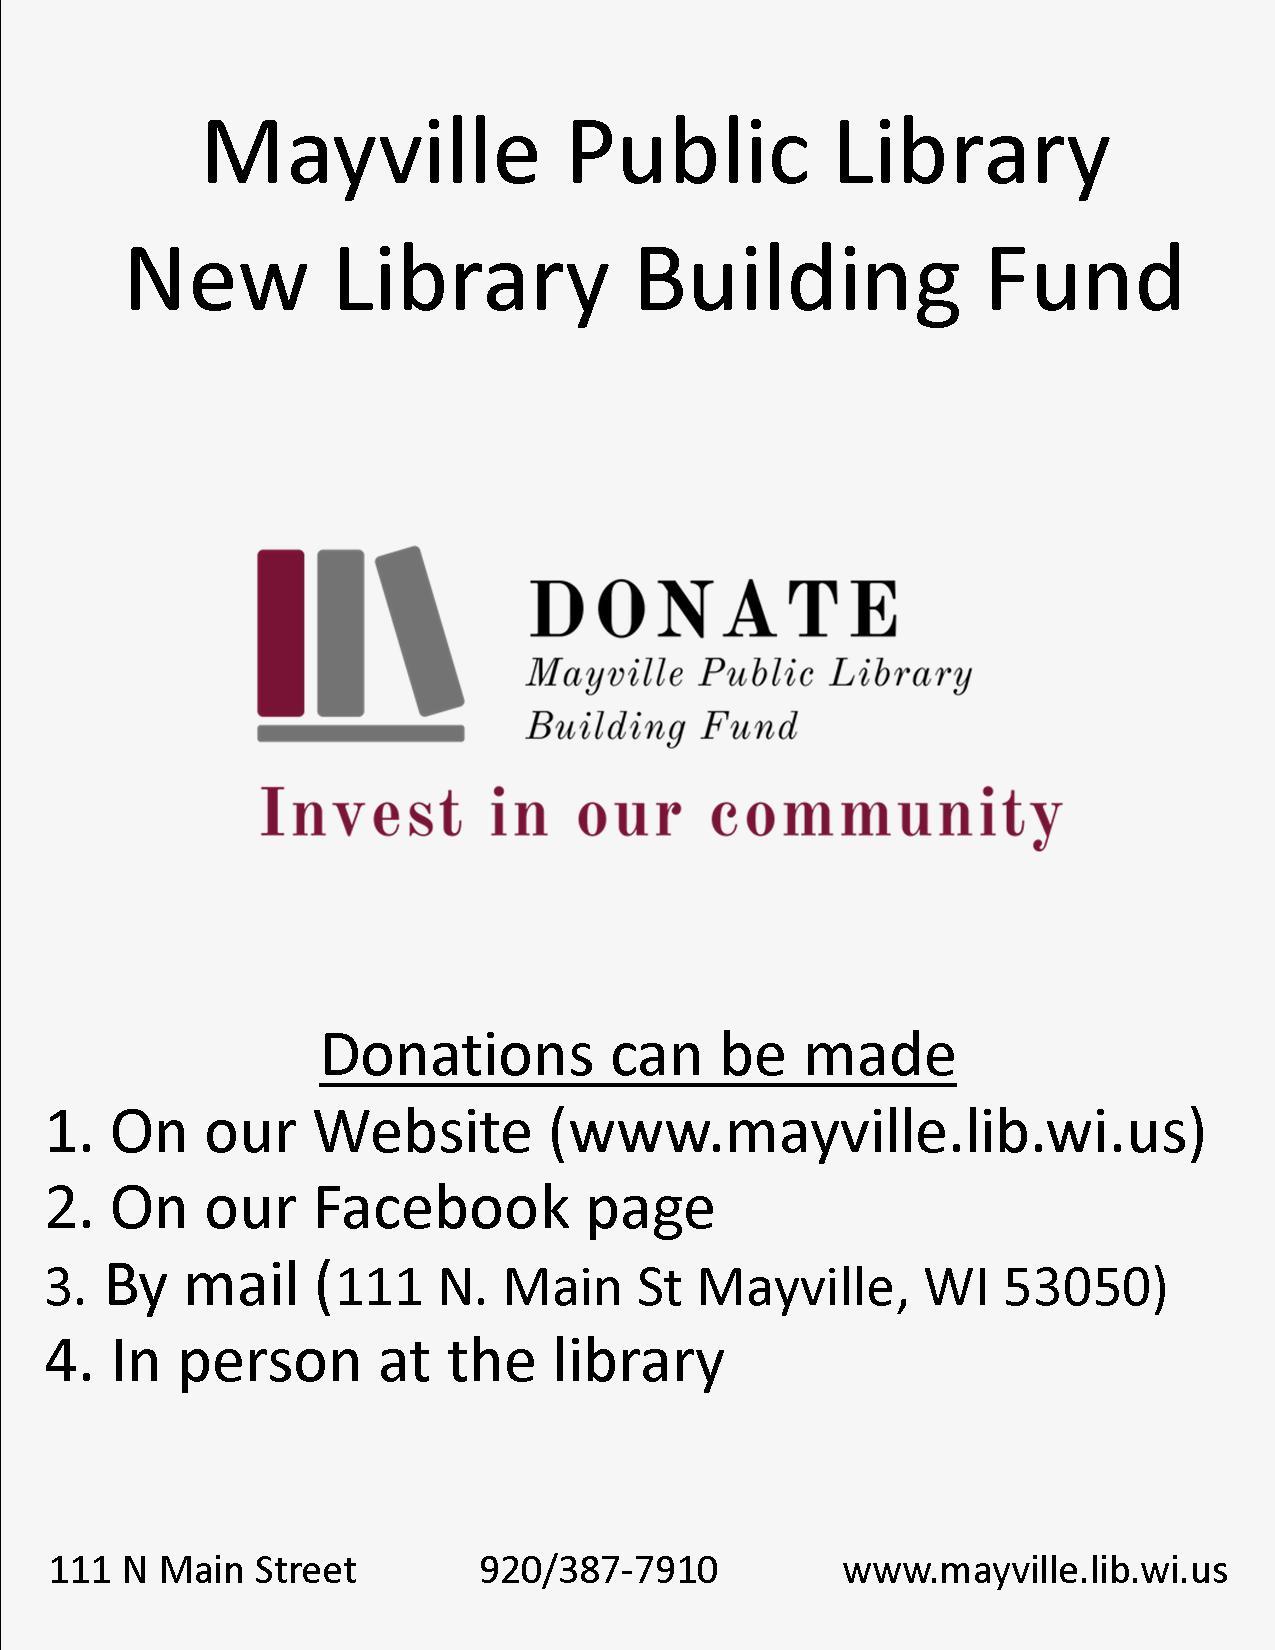 Mayville Public Library   111 N  Main St, Mayville, WI 53050 (920